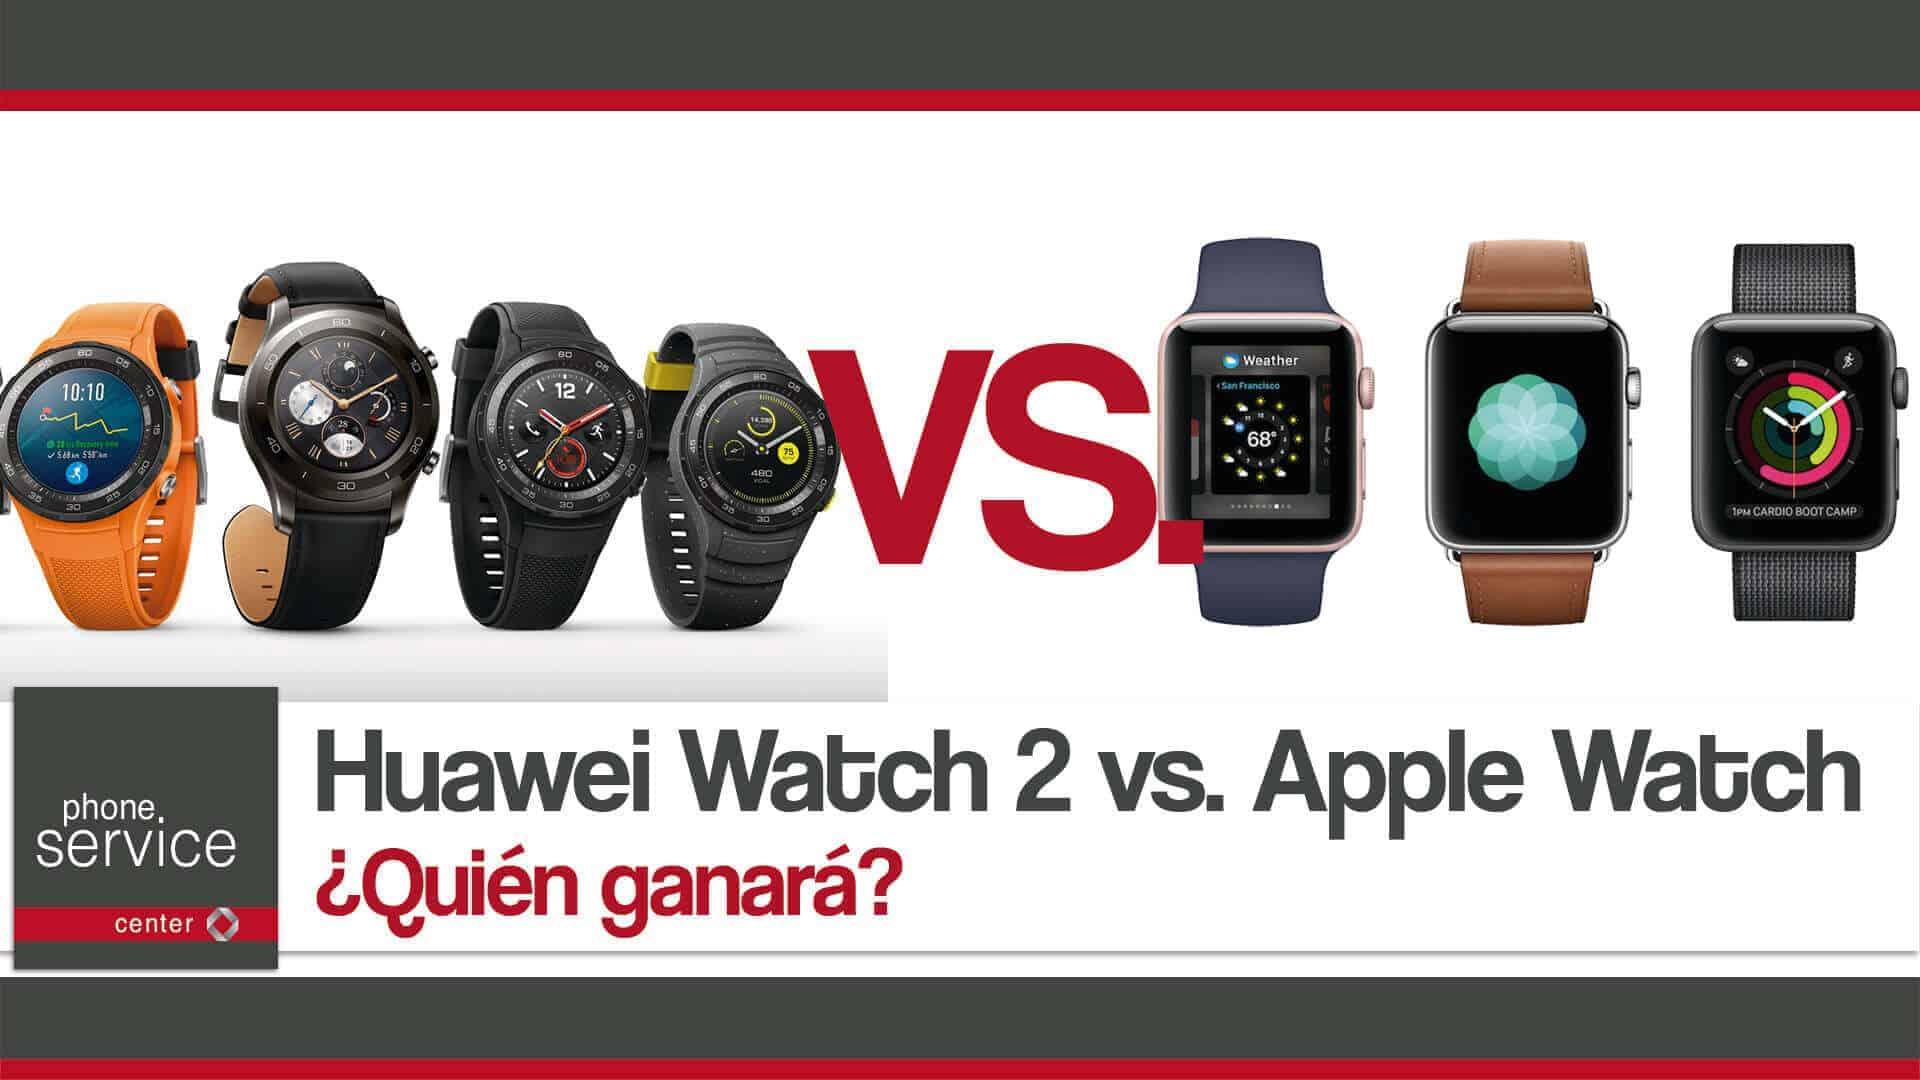 Huawei Watch 2 vs. Apple Watch